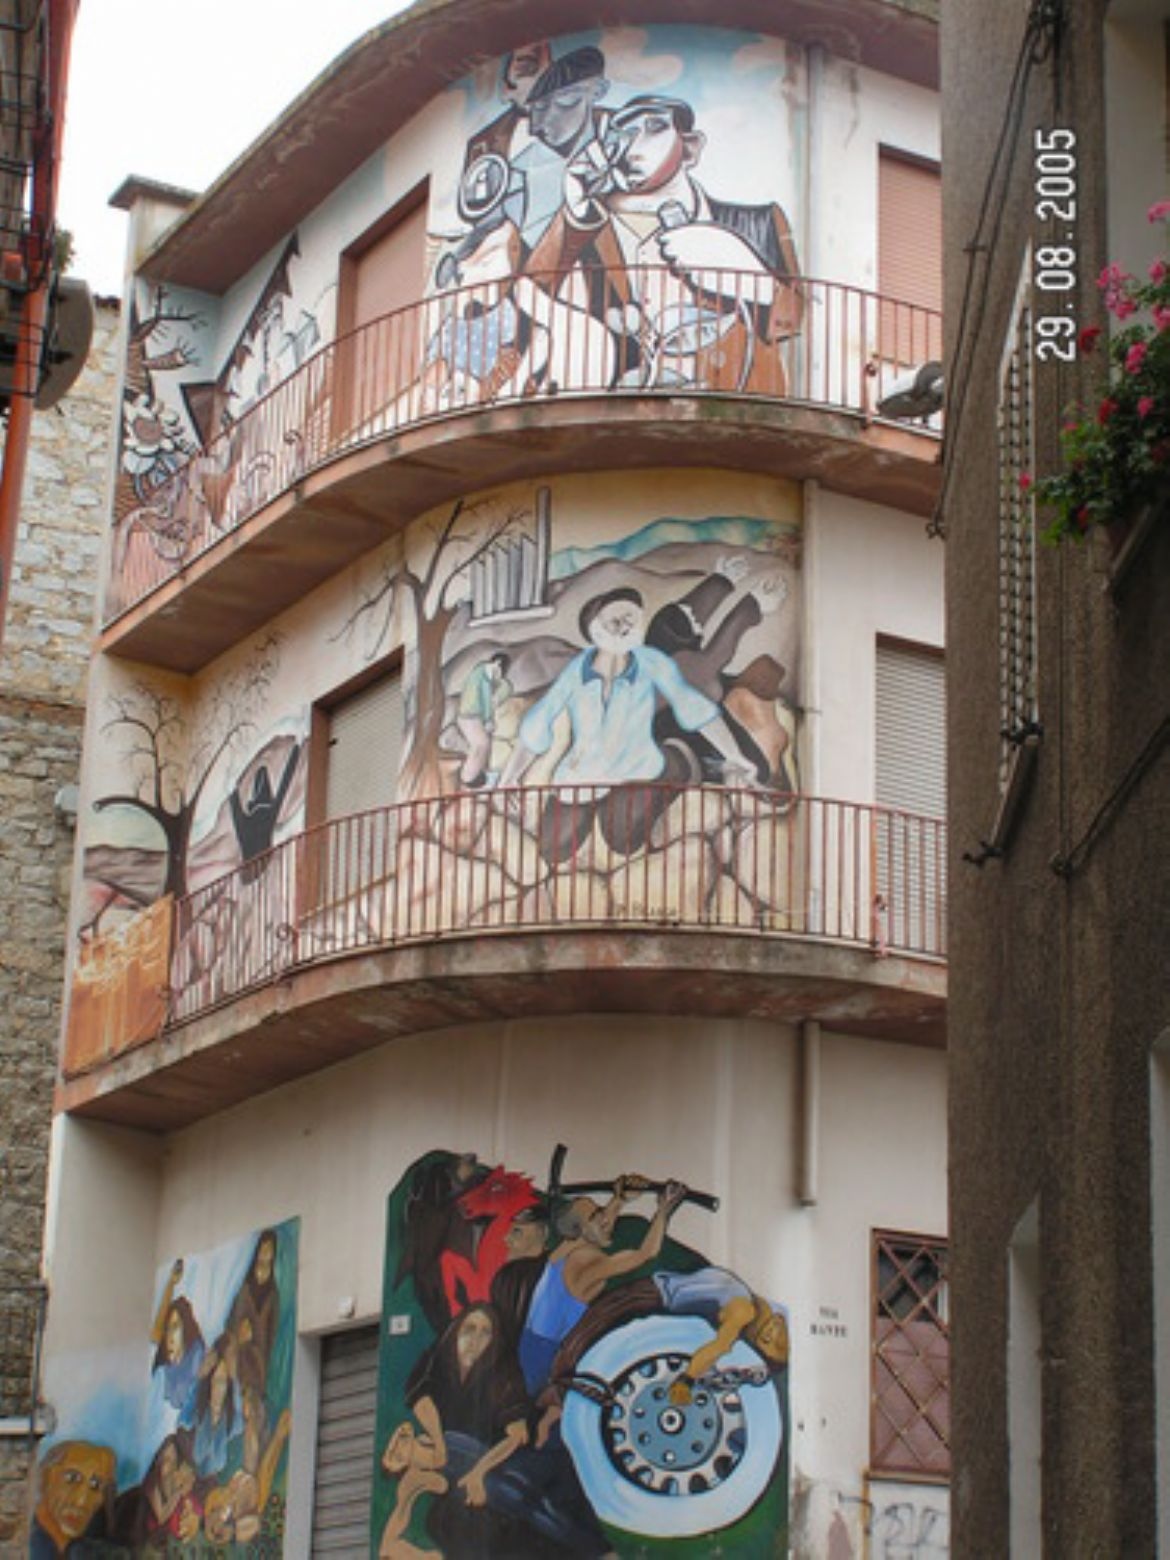 Leggi: Orgosolo: paese dei murales